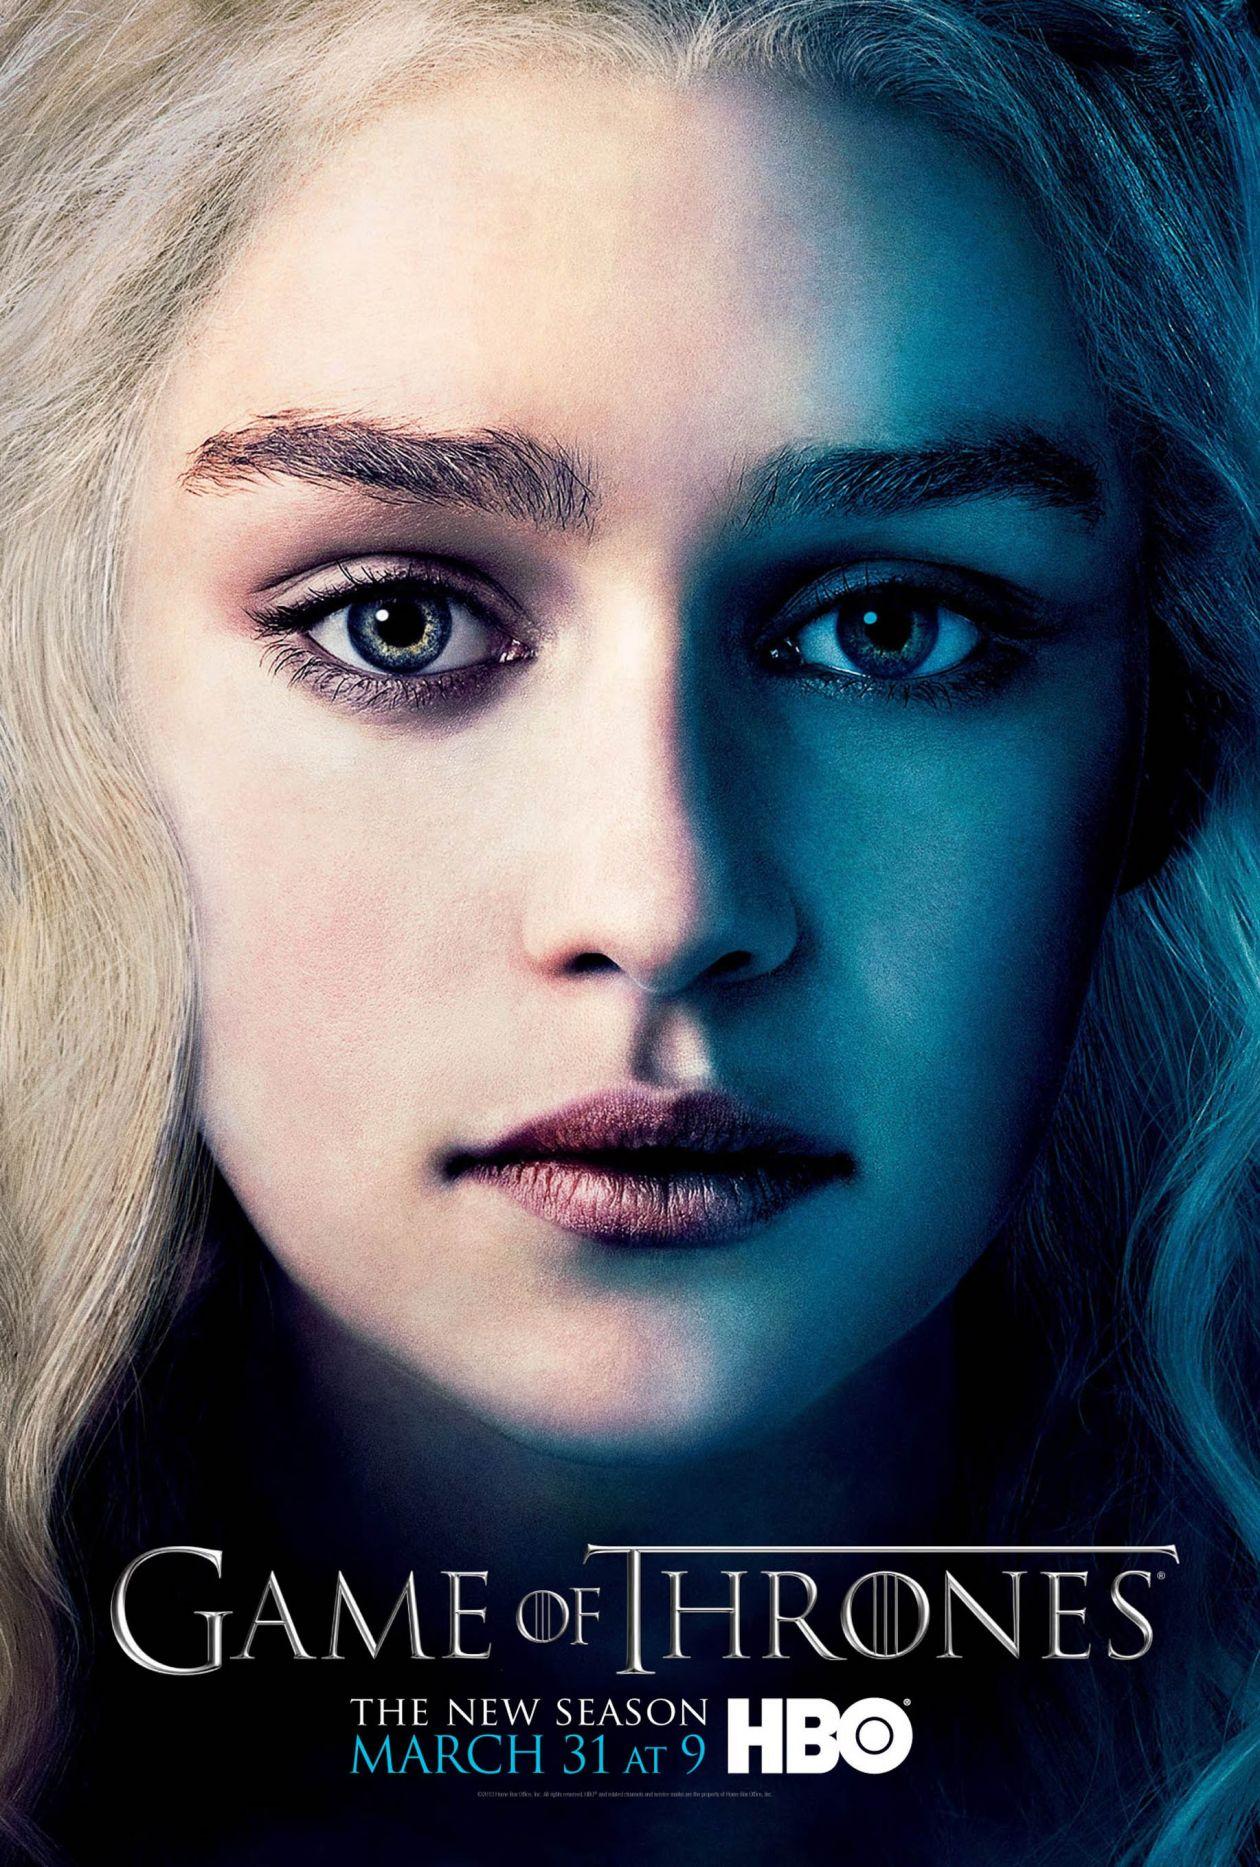 Emilia Clarke actress   Queen Daenerys Targaryen / Game of Thrones / Movie Series Poster Affiche série